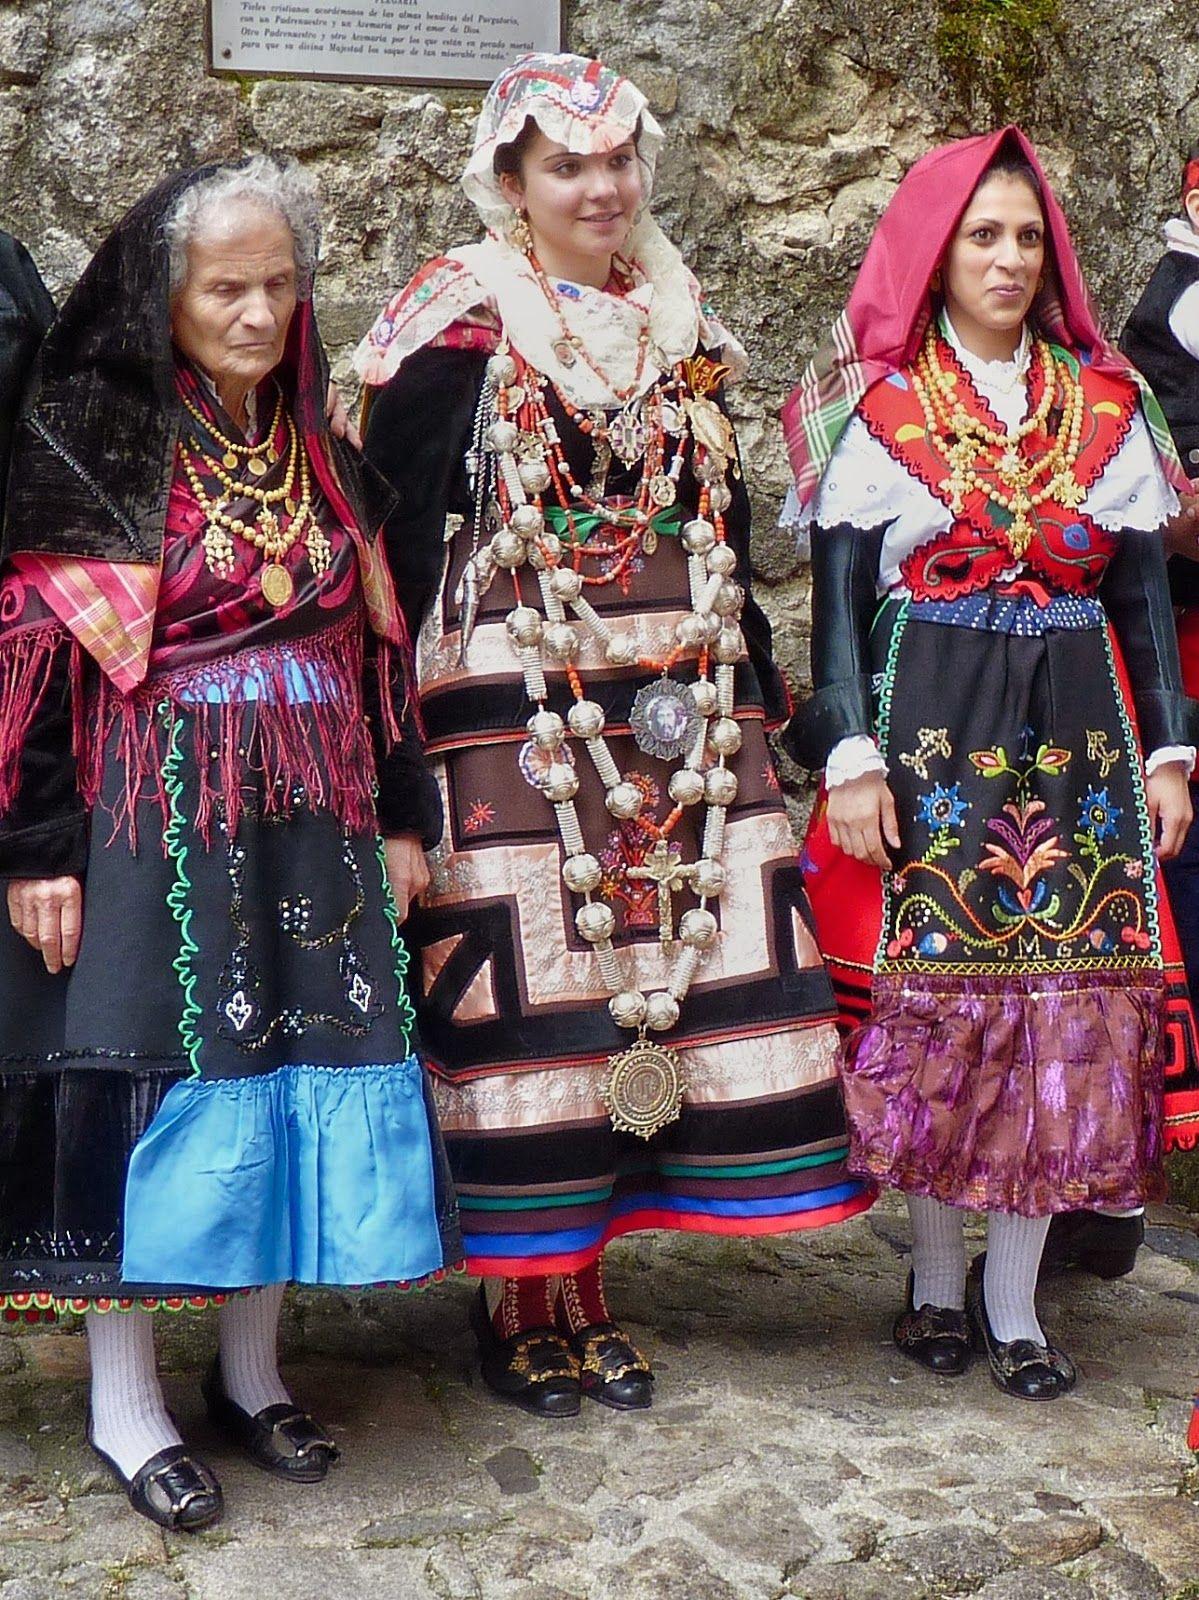 Spain Bride From Salamanca Spain Wearing Traditional